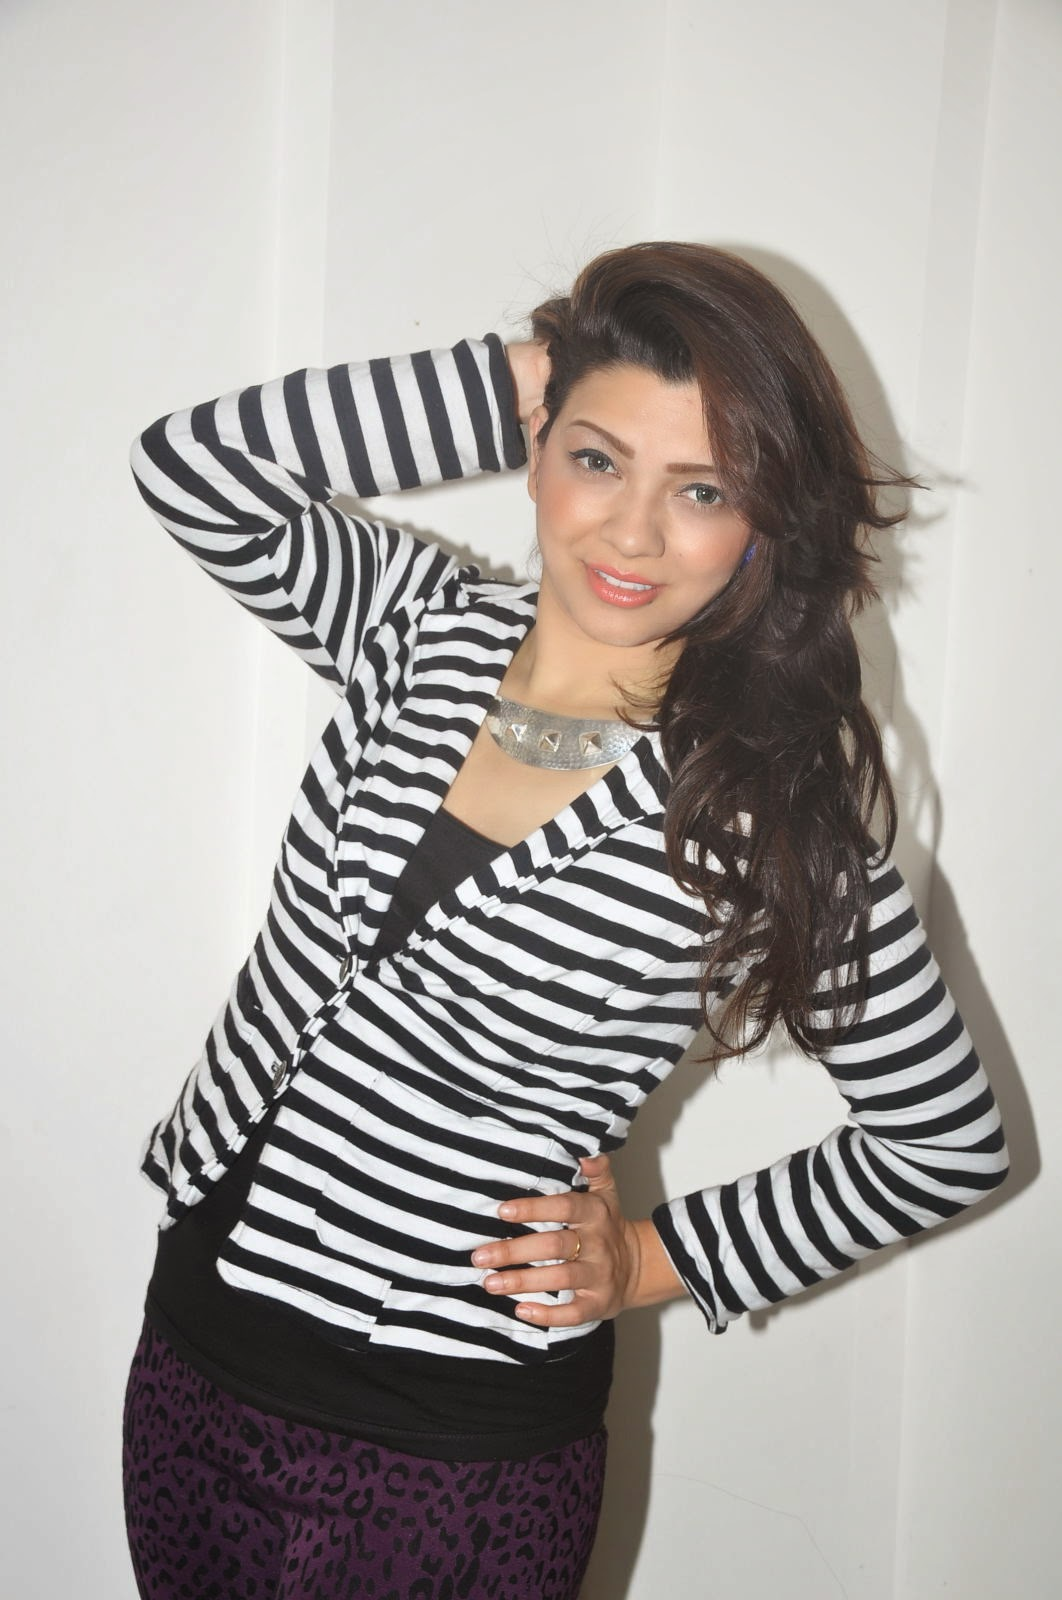 Actress Pari Nidhi Glam photos Gallery-HQ-Photo-17